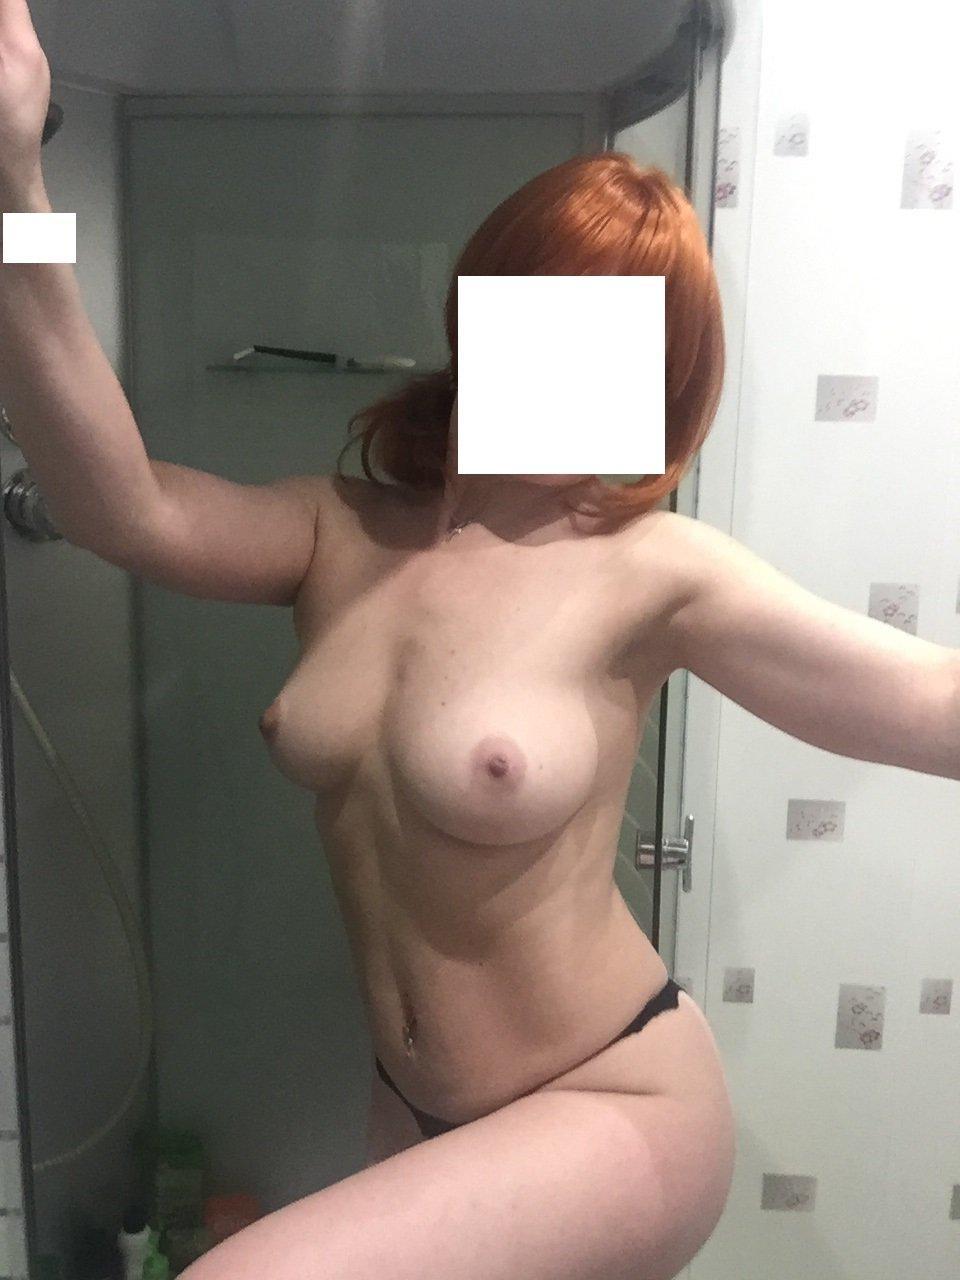 Путана Индивидуалка, 23 года, метро Ломоносовский проспект